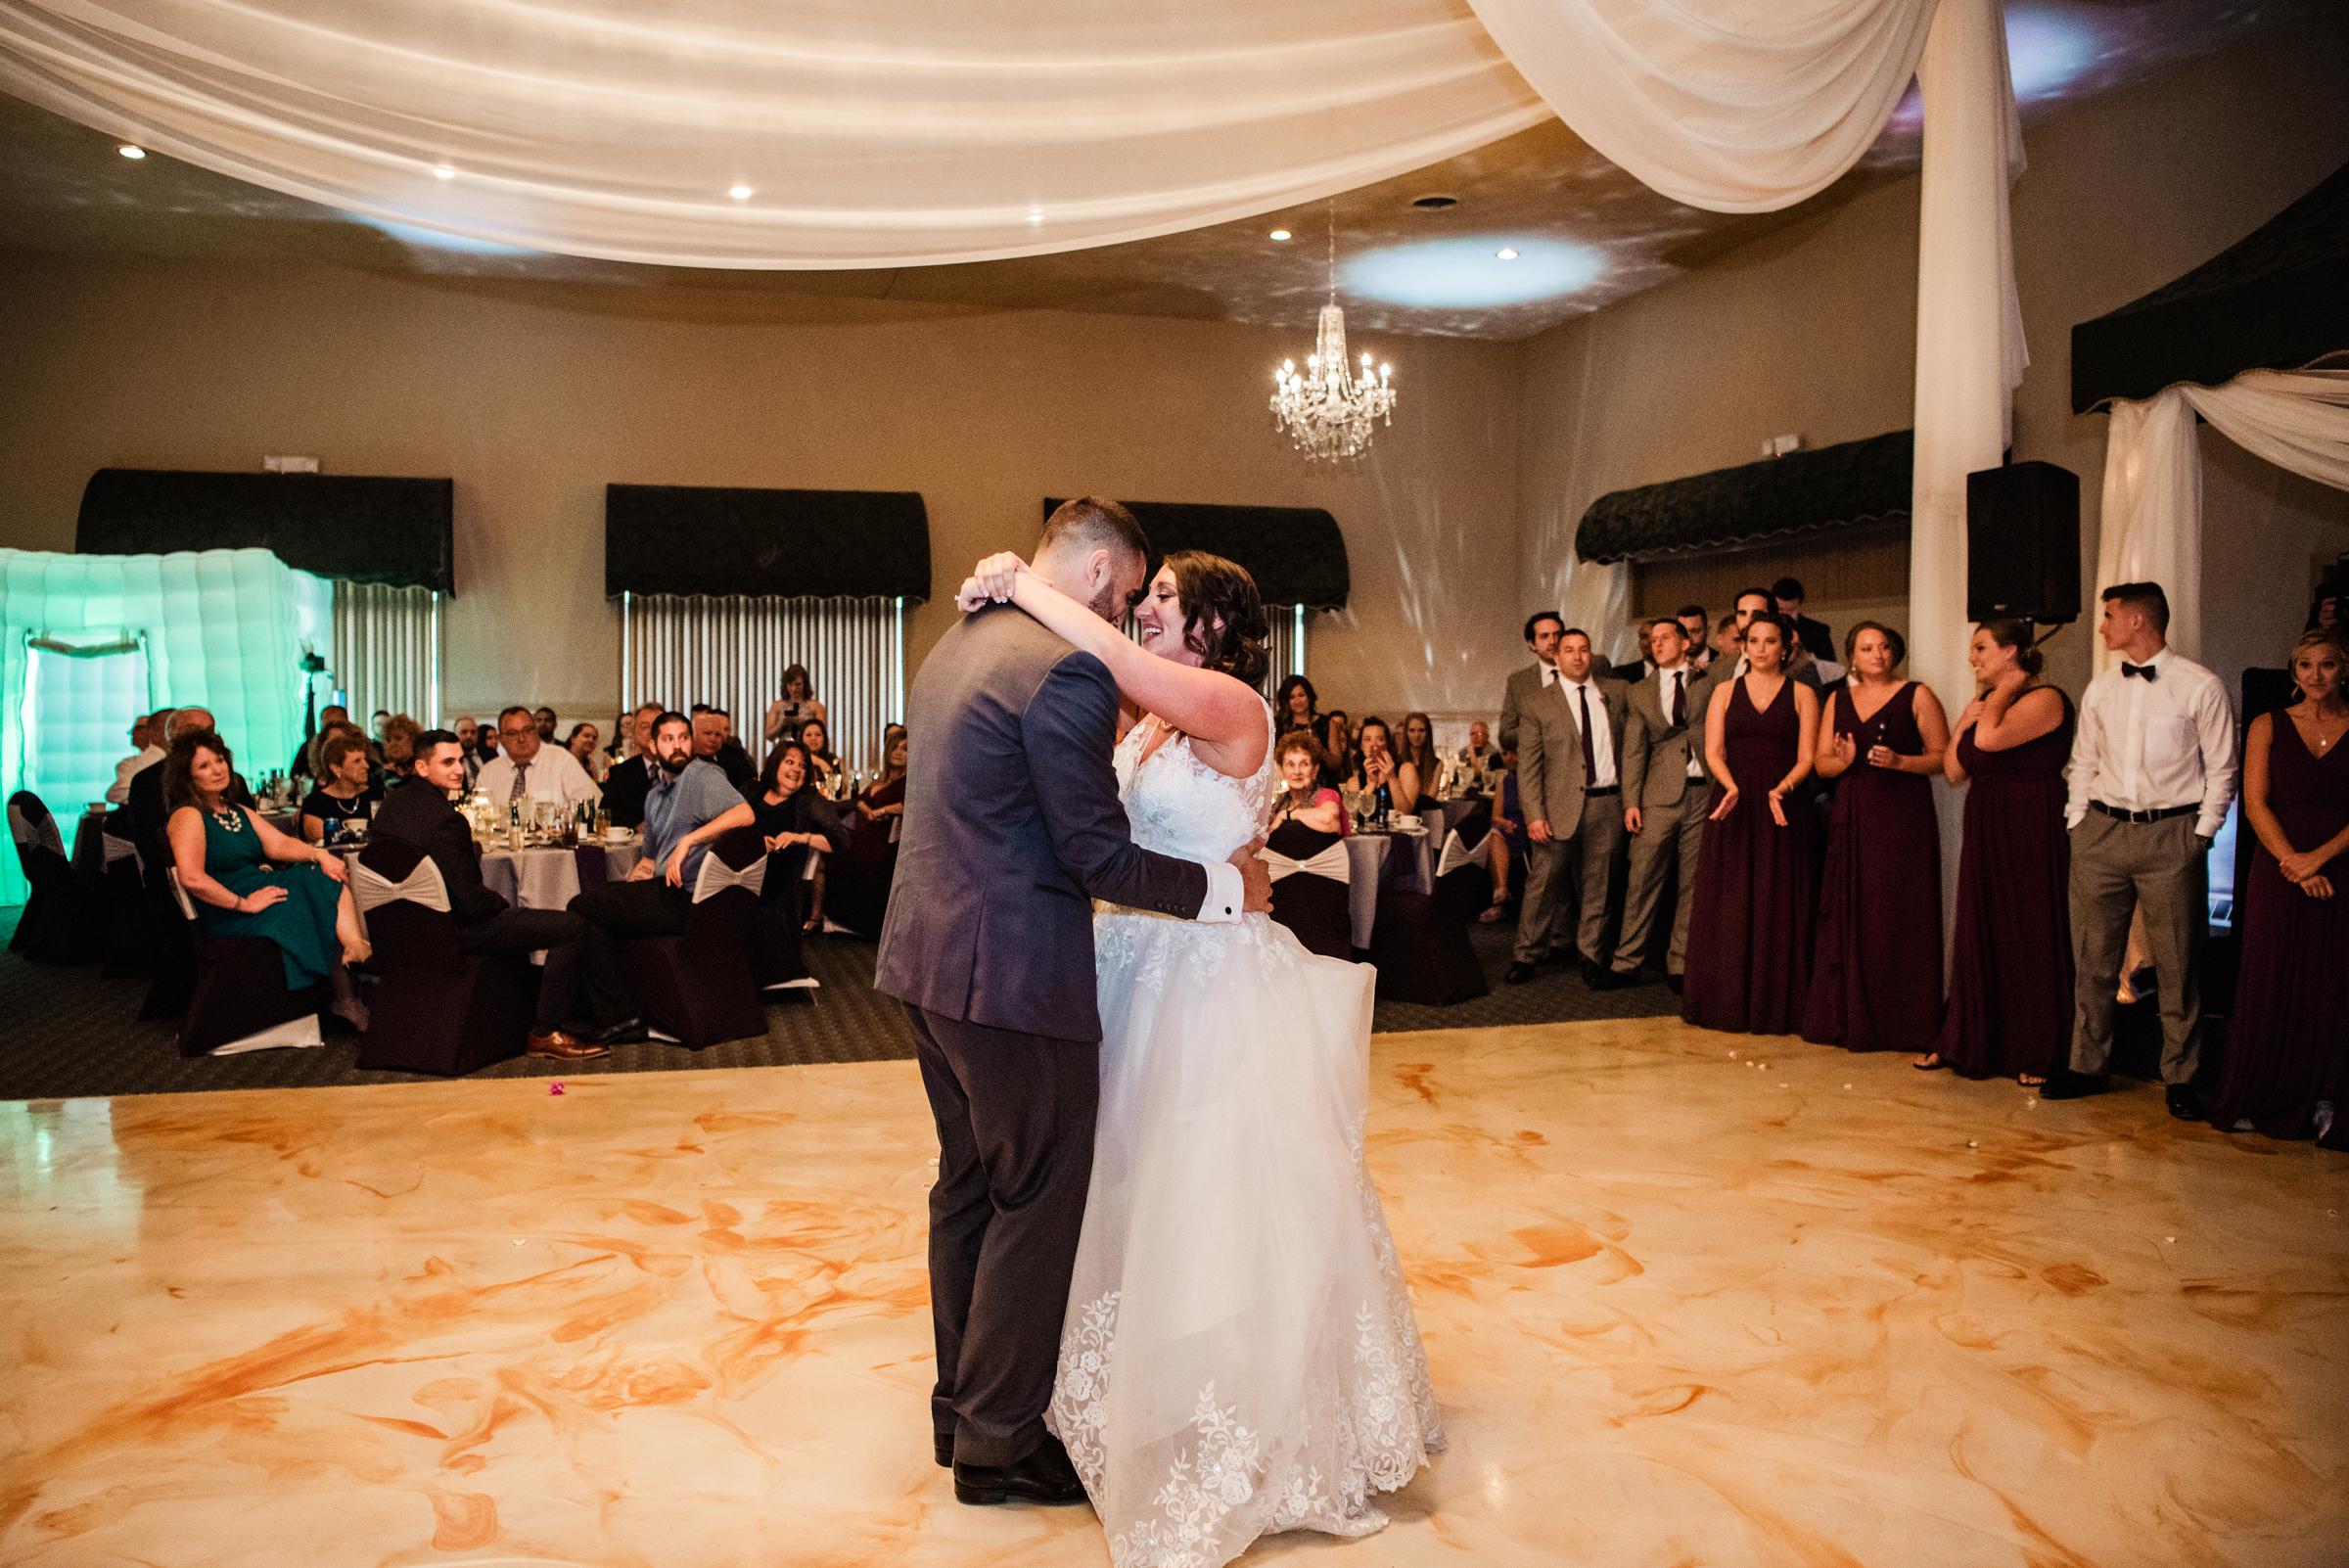 Historic_Old_St_Johns_Church_Valentinos_Banquet_Hall_Central_NY_Wedding_JILL_STUDIO_Rochester_NY_Photographer_DSC_6687.jpg